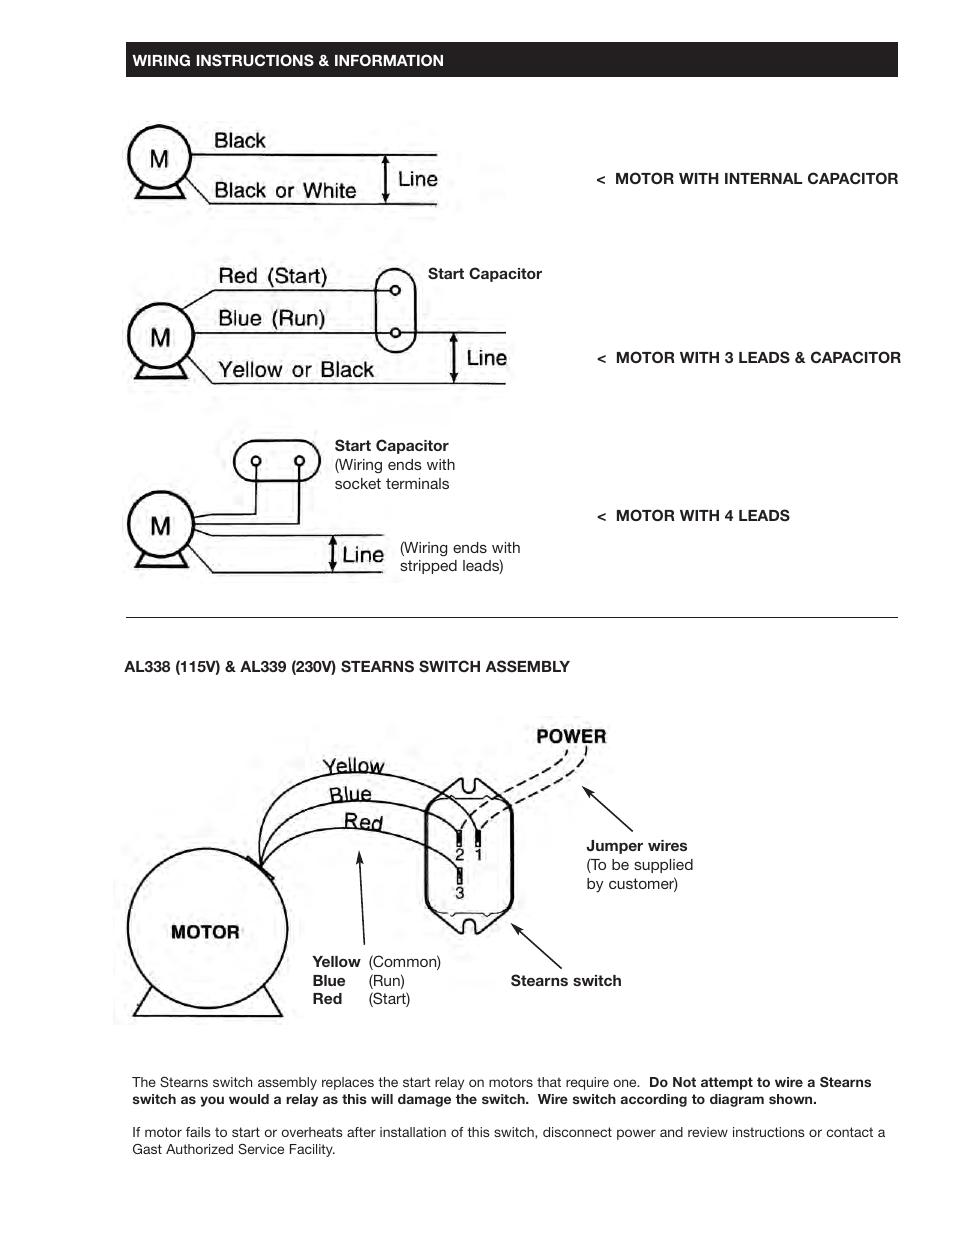 gast 1534 series oilless vacuum pumps and compressors page9 gast 1534 series oilless vacuum pumps and compressors user manual gast vacuum pump wiring diagrams at soozxer.org